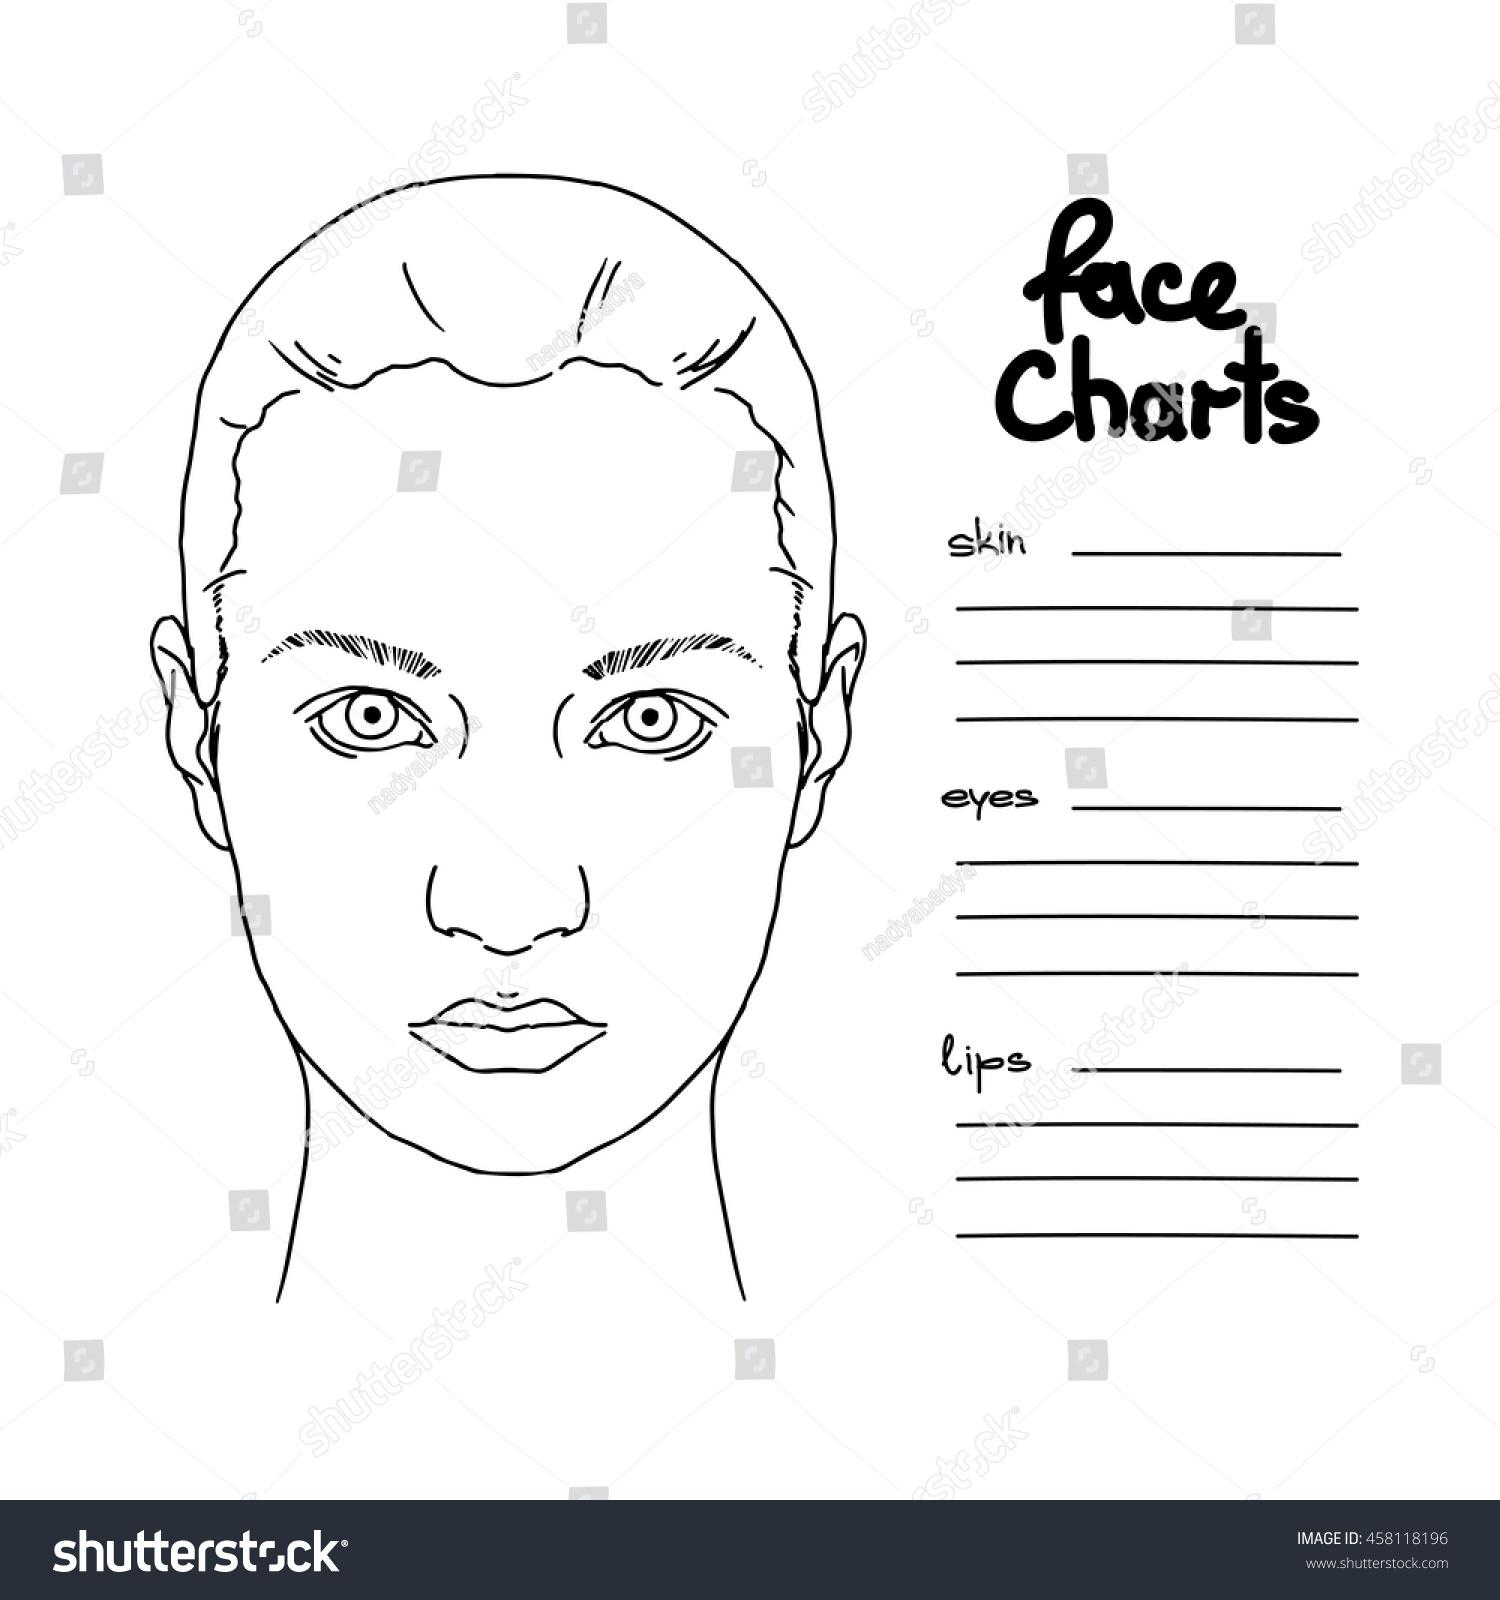 Eye chart template 100 eye multiplication equations worksheet simple dmv eye charts choice image chart example ideas stock vector beautiful woman portrait face chart makeup nvjuhfo Images